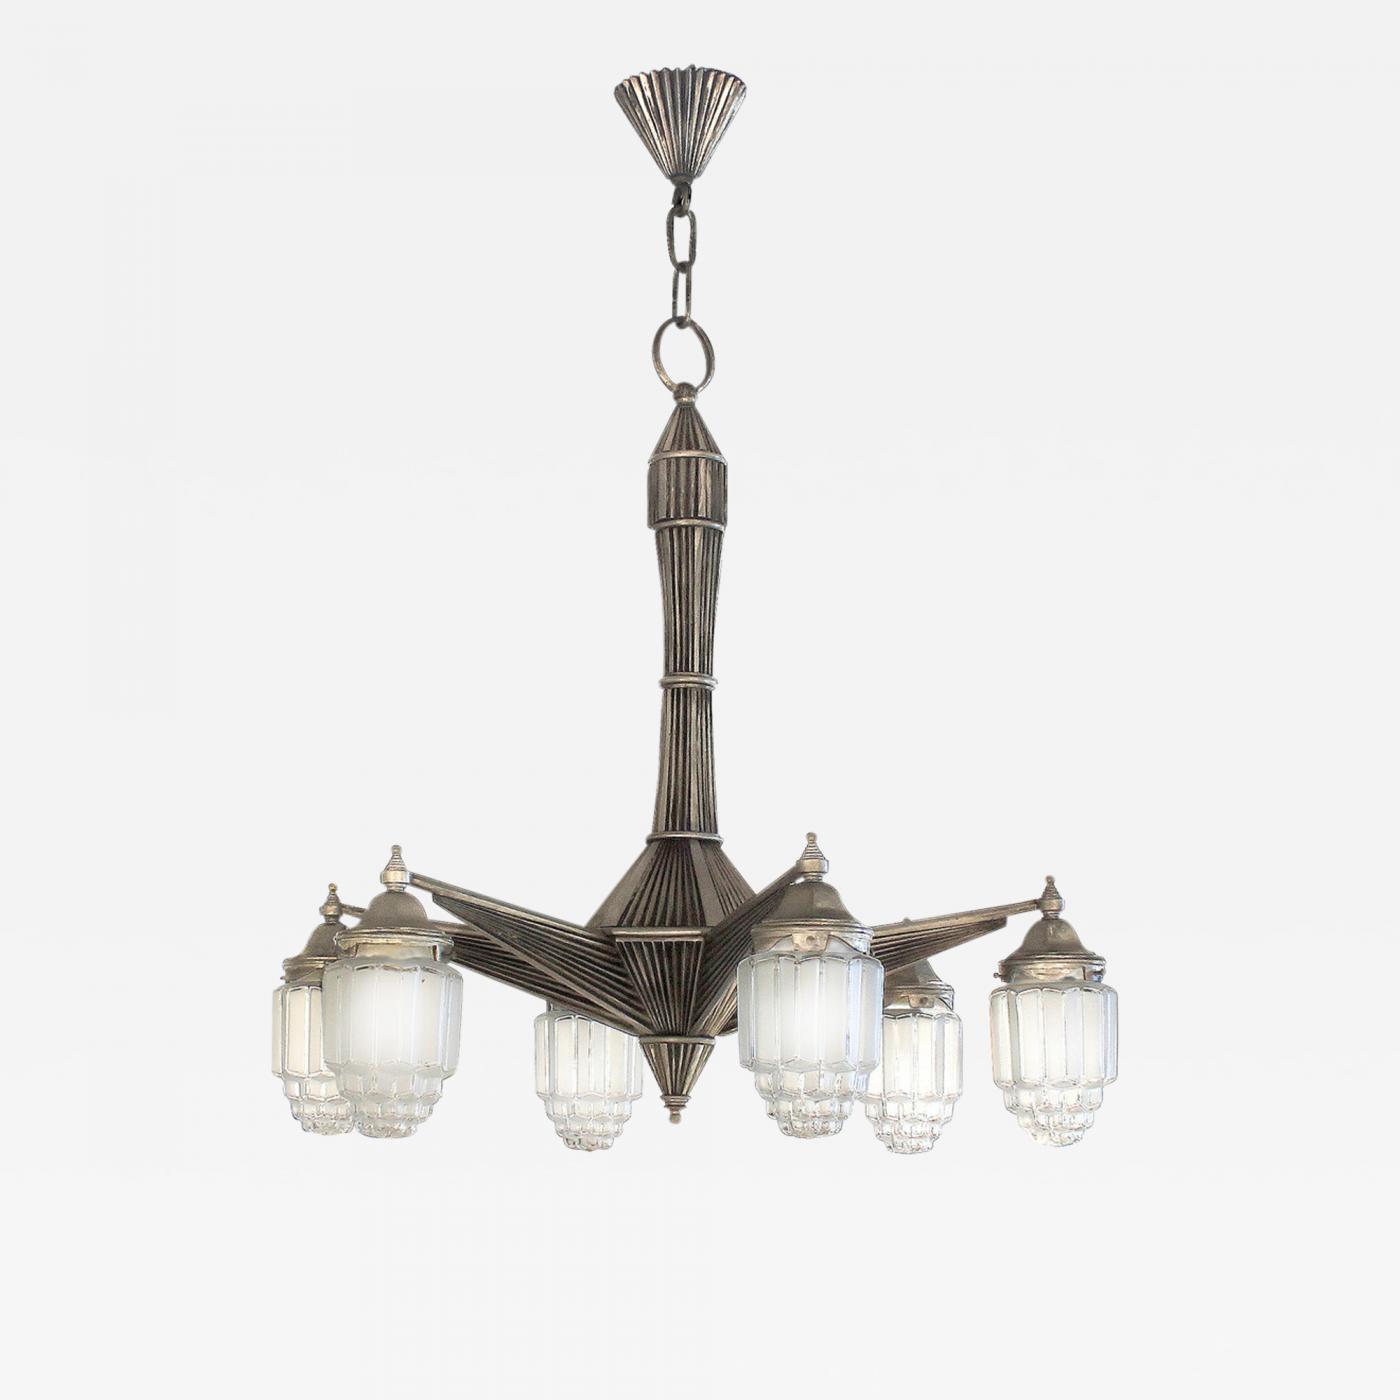 Listings furniture lighting chandeliers and pendants · art deco chandelier with skyscraper